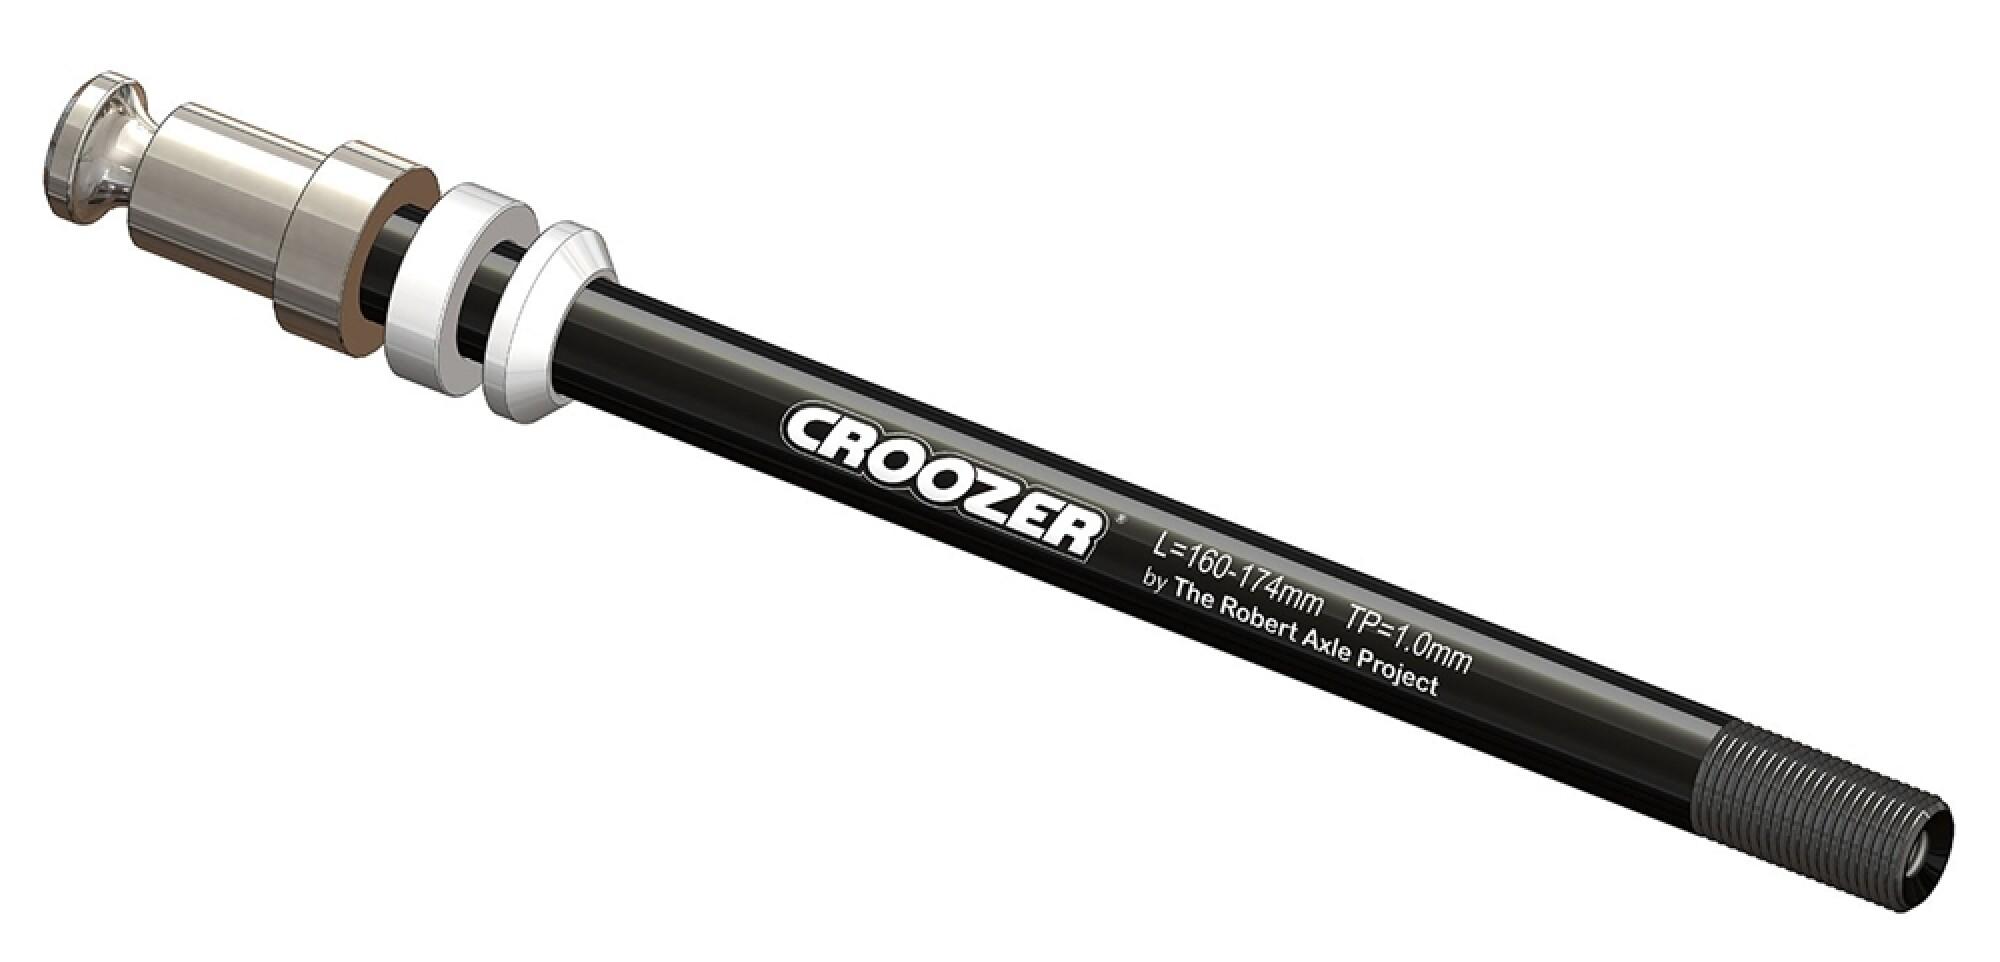 zubeh r teile croozer croozer kupplung click crooz. Black Bedroom Furniture Sets. Home Design Ideas